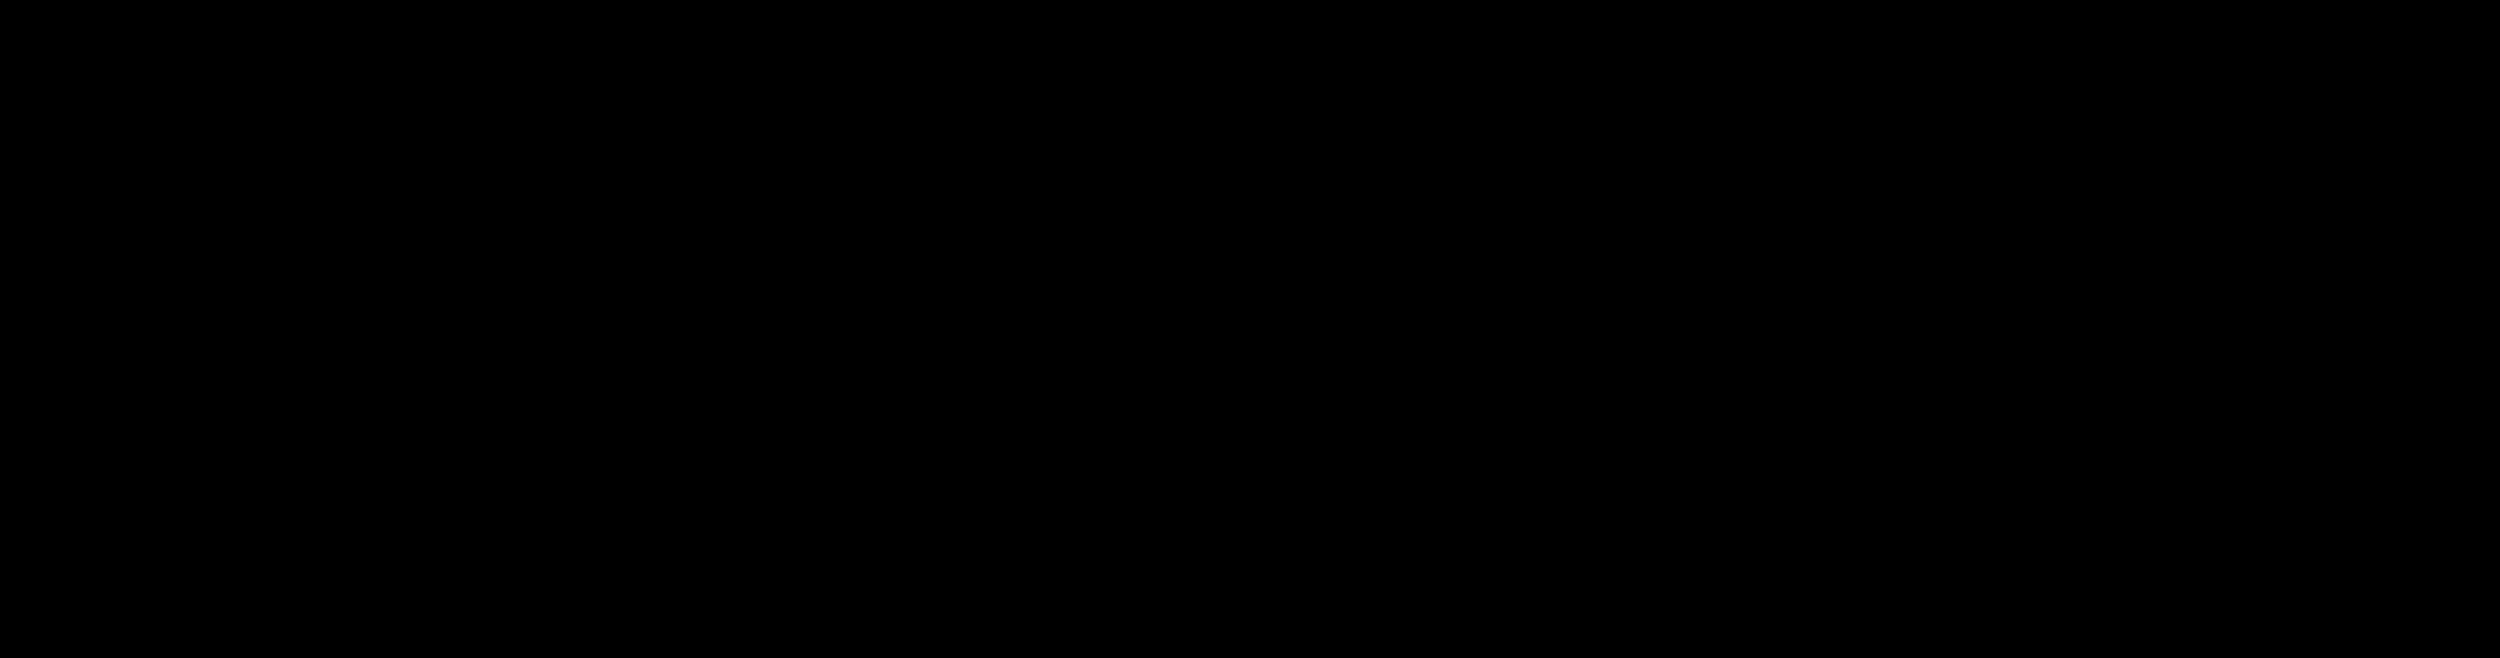 kisspng-forbes-logo-marketing-business-company-magazine-5aceb3267e5c01.8968743715234957185176.png